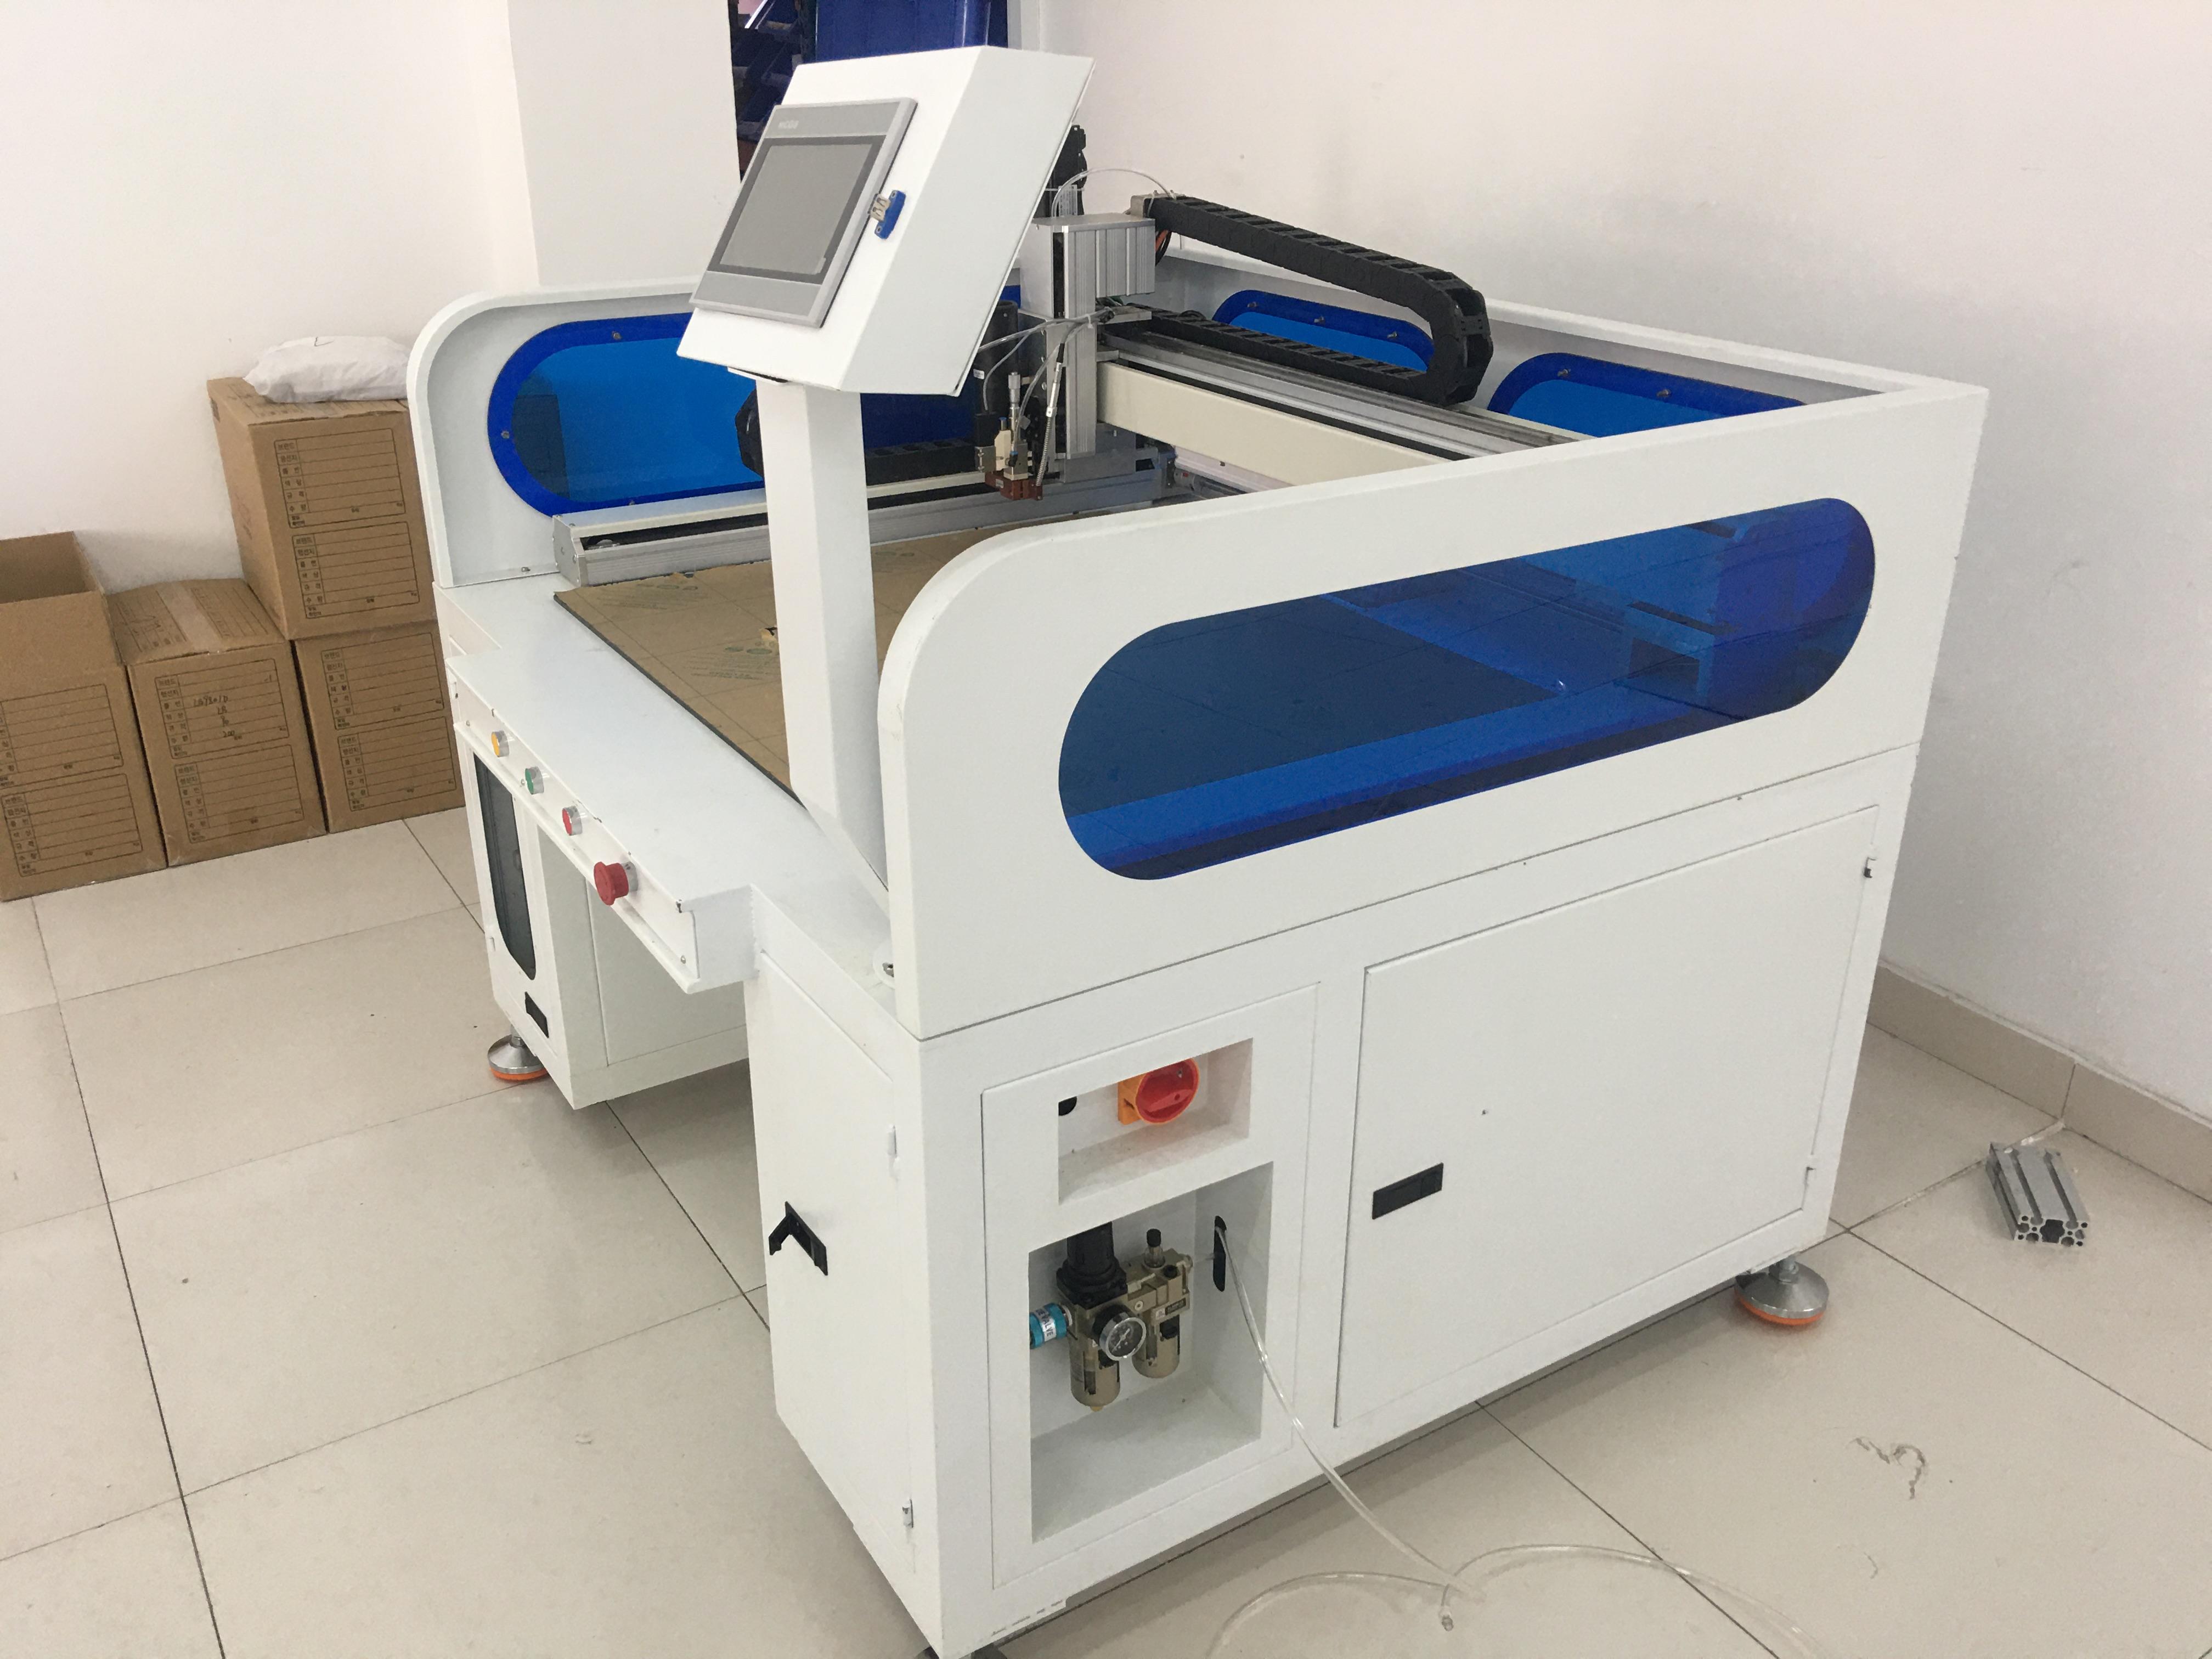 Longmen platform structure design automatic high precisioeasy operation glue dispenser BT - 9080